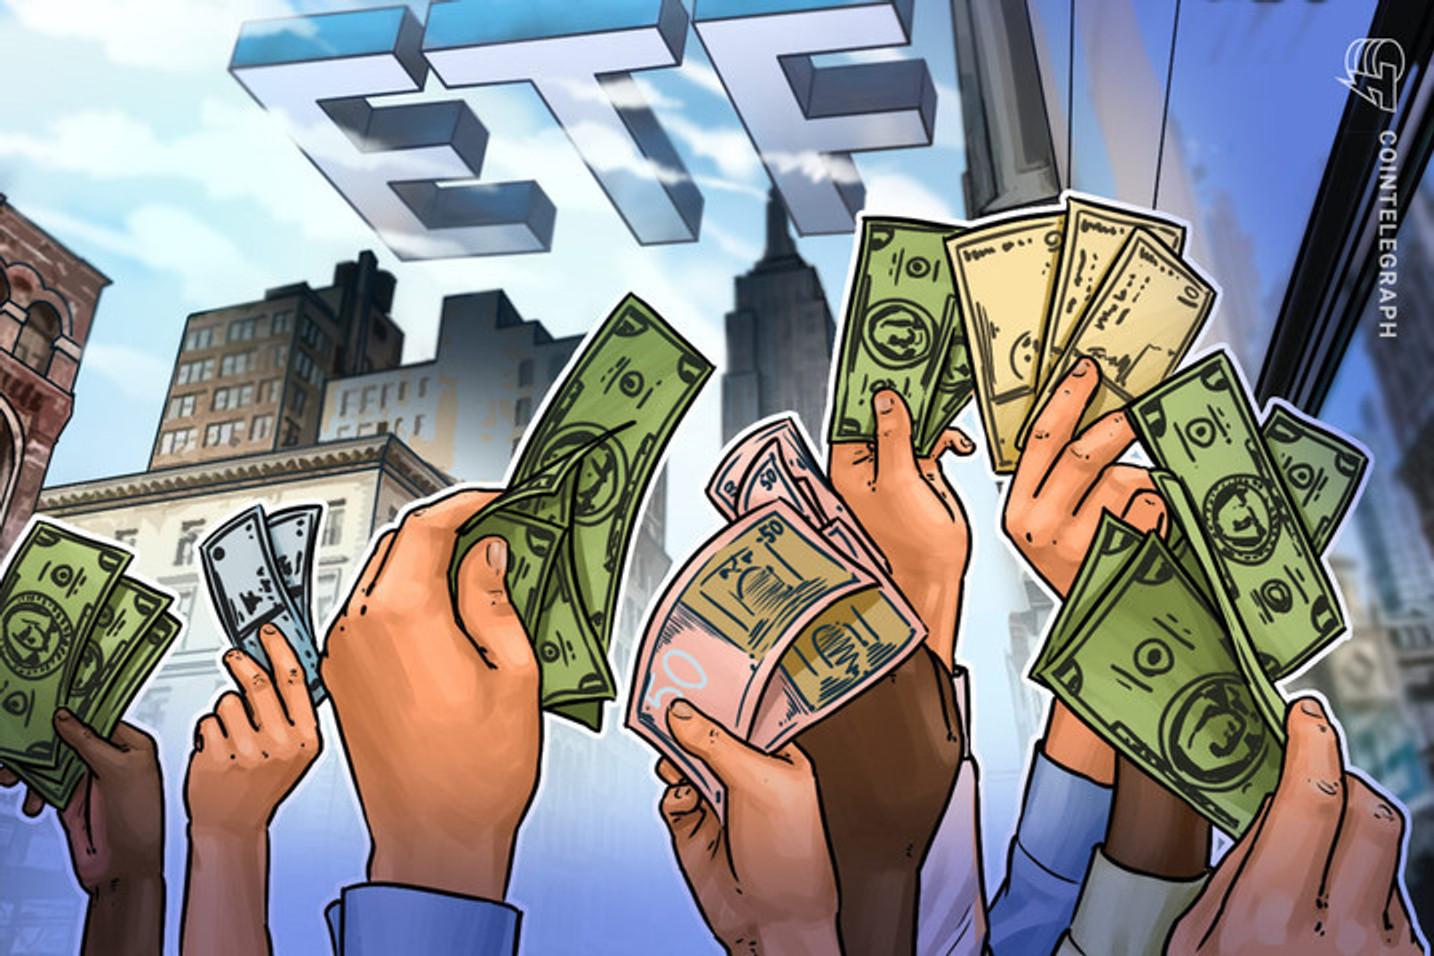 B3 anuncia parceria com QR Capital, Hashdex, XP e lança portal exclusivo sobre investimento em ETFs